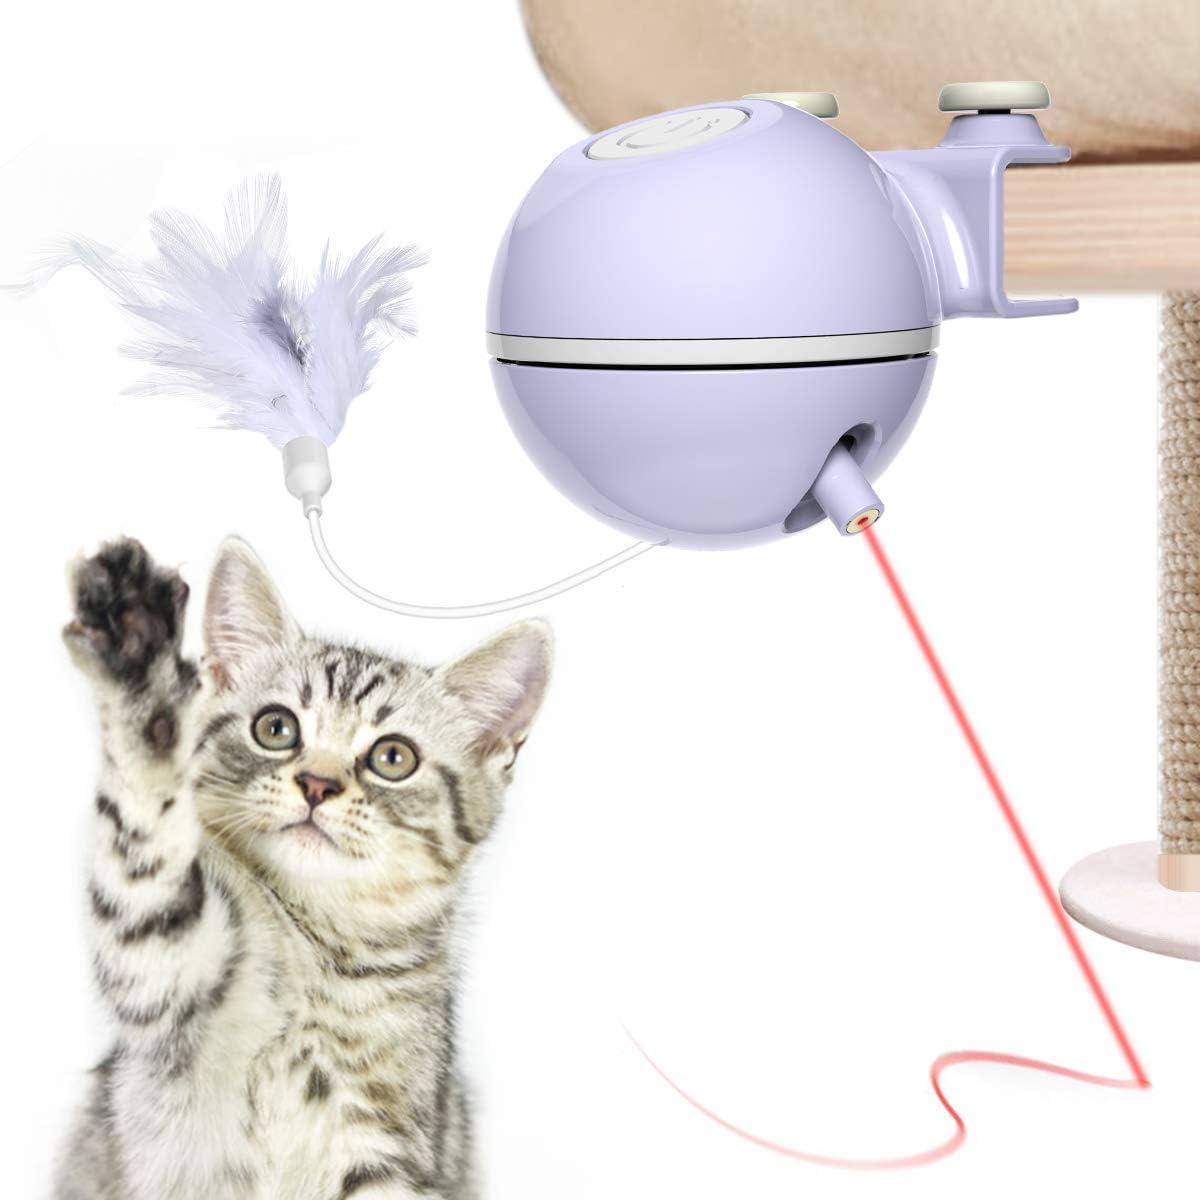 DADYPET Juguetes para Gatos interactivos,Electrónico Juguete Gato ...